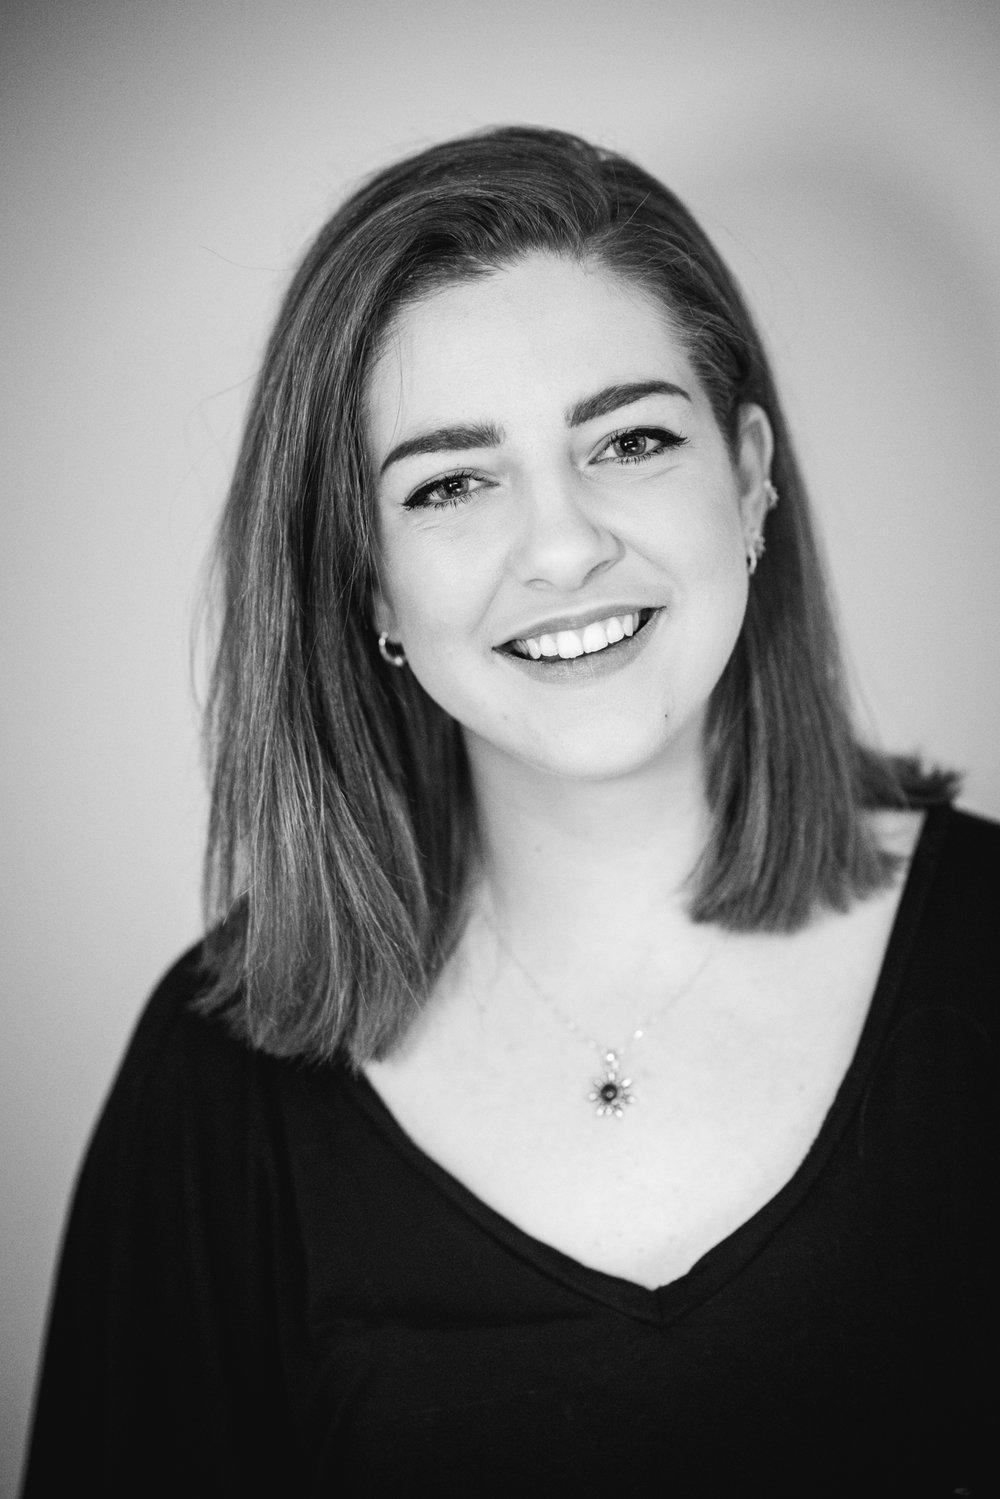 Fran Ramsey, Sponsorship Director